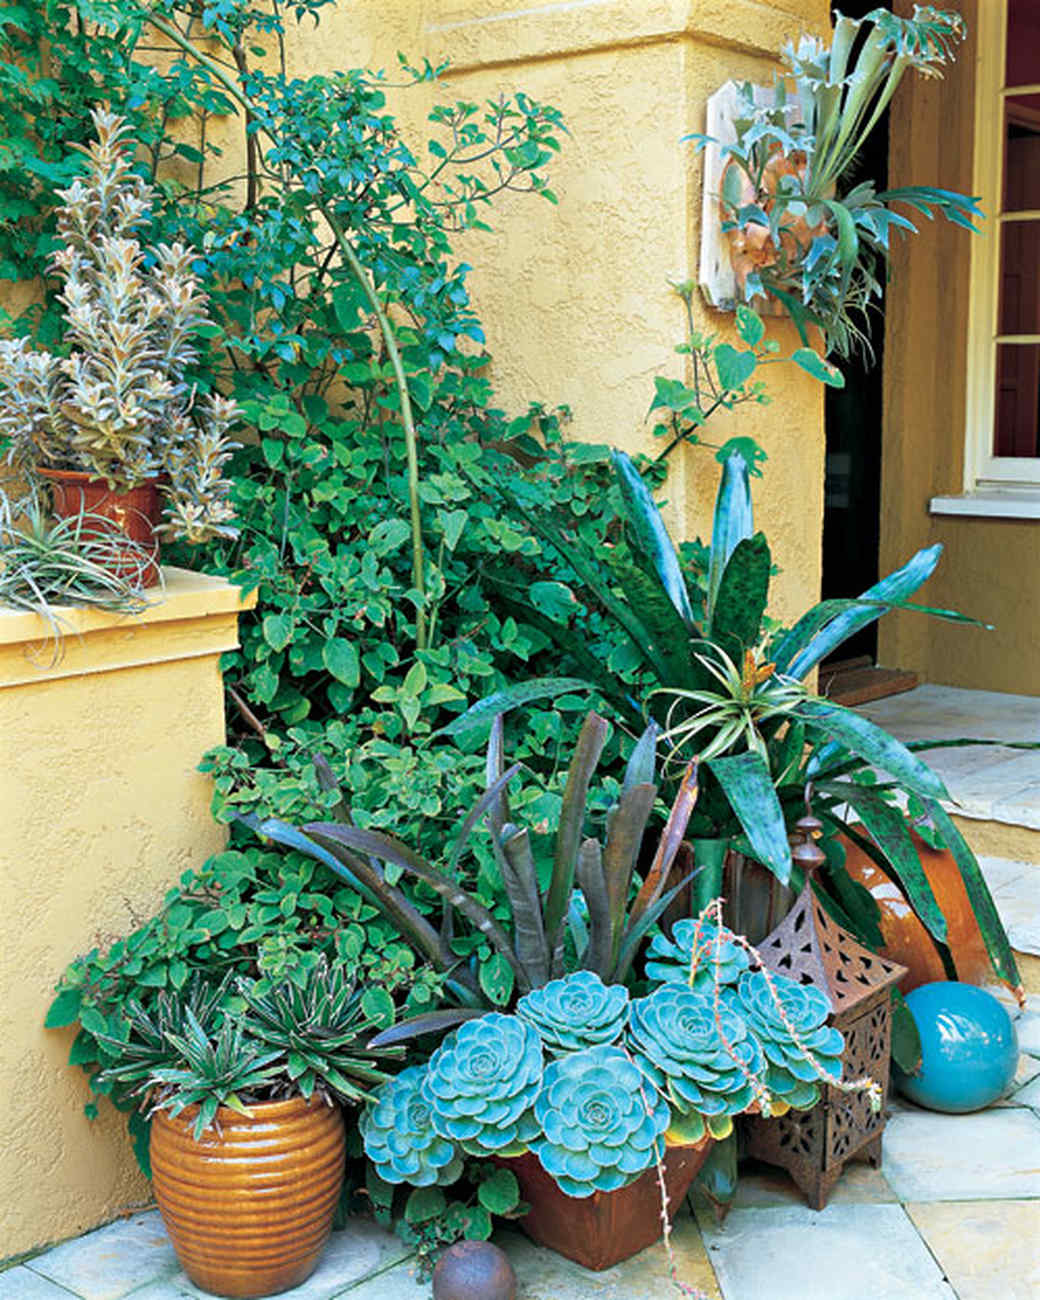 mla10351_sept2008_garden12.jpg